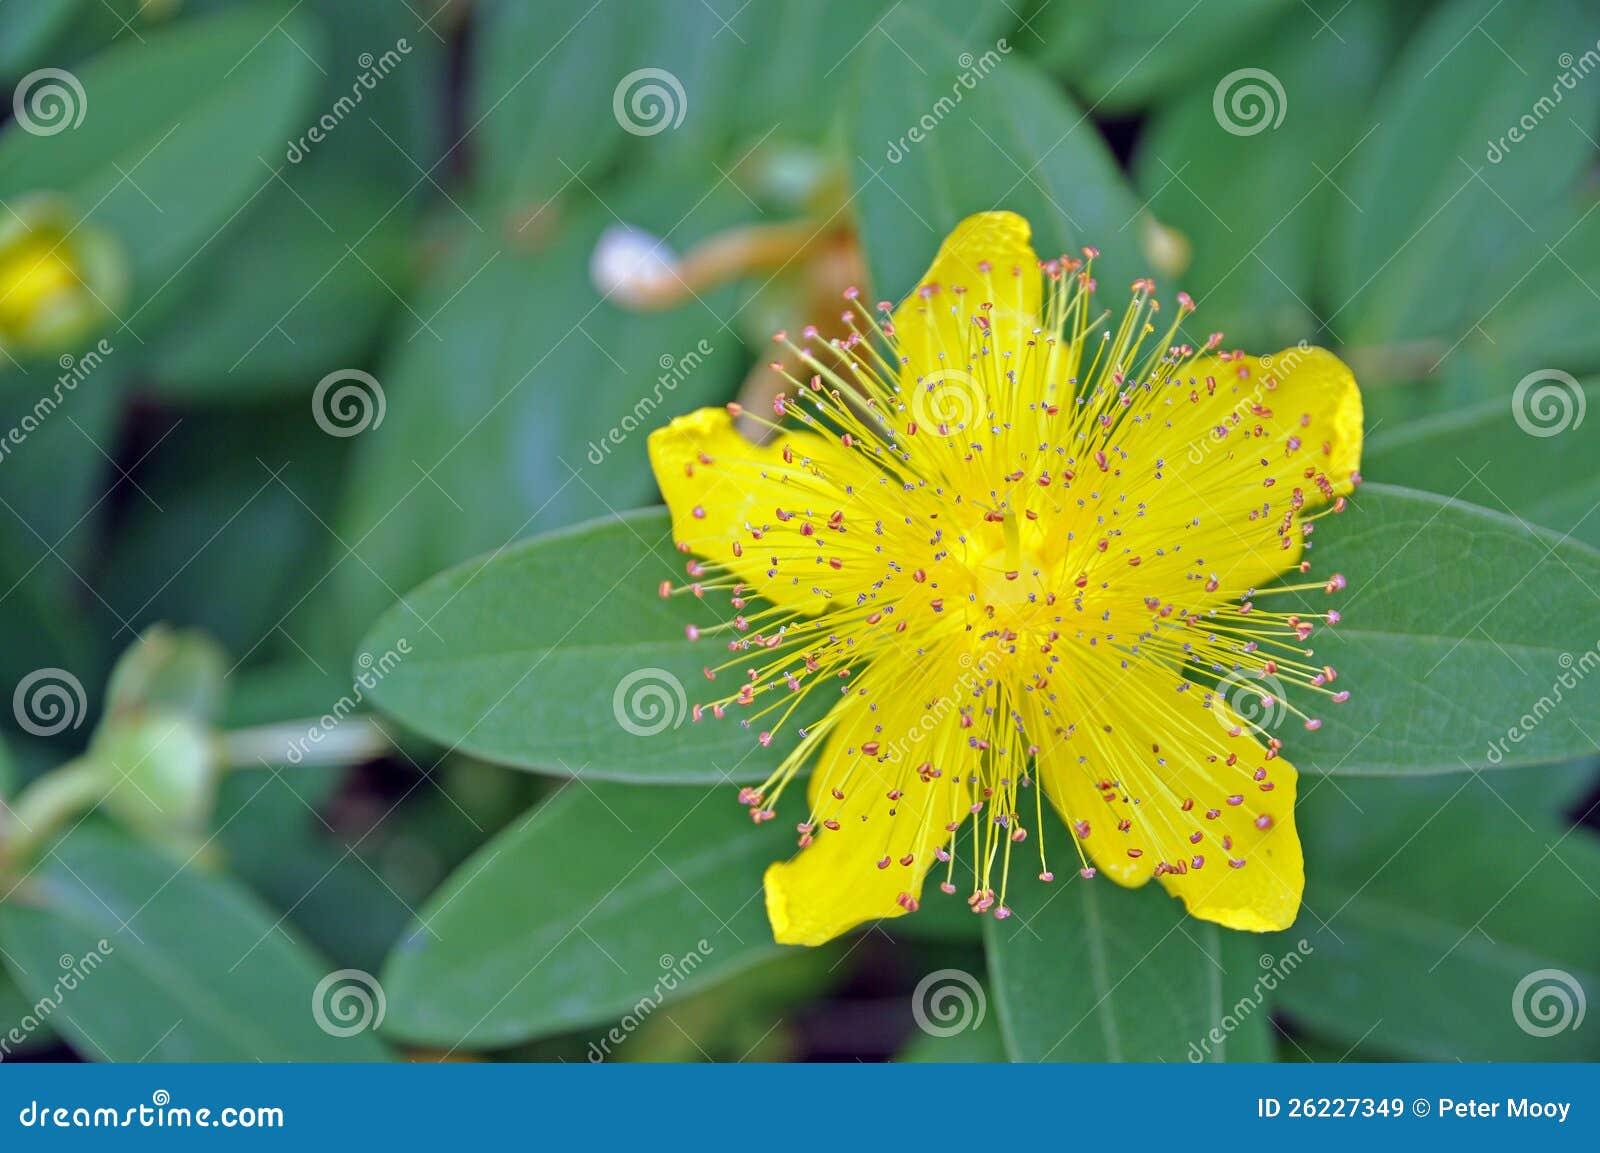 Rose Of Sharon Stock Image Image Of Nature Vivid Flora 26227349